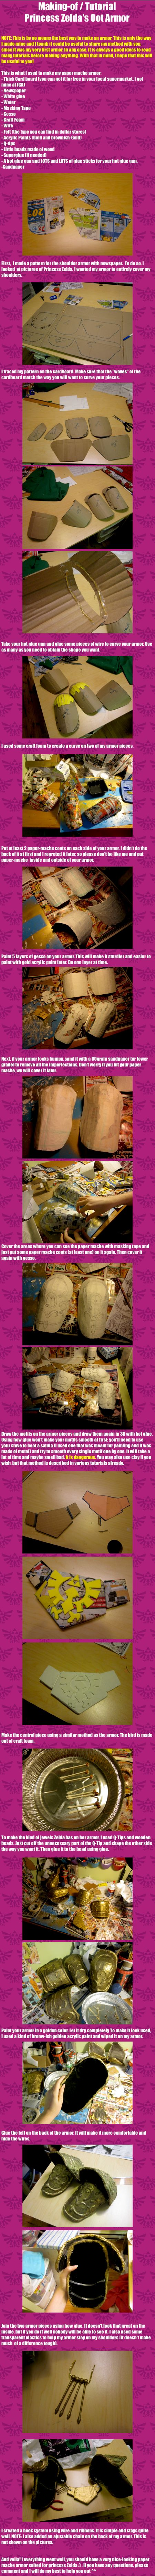 Making-of / Tutorial of Princess Zeldas OoT armor by ~Kisshu-Neko on deviantART